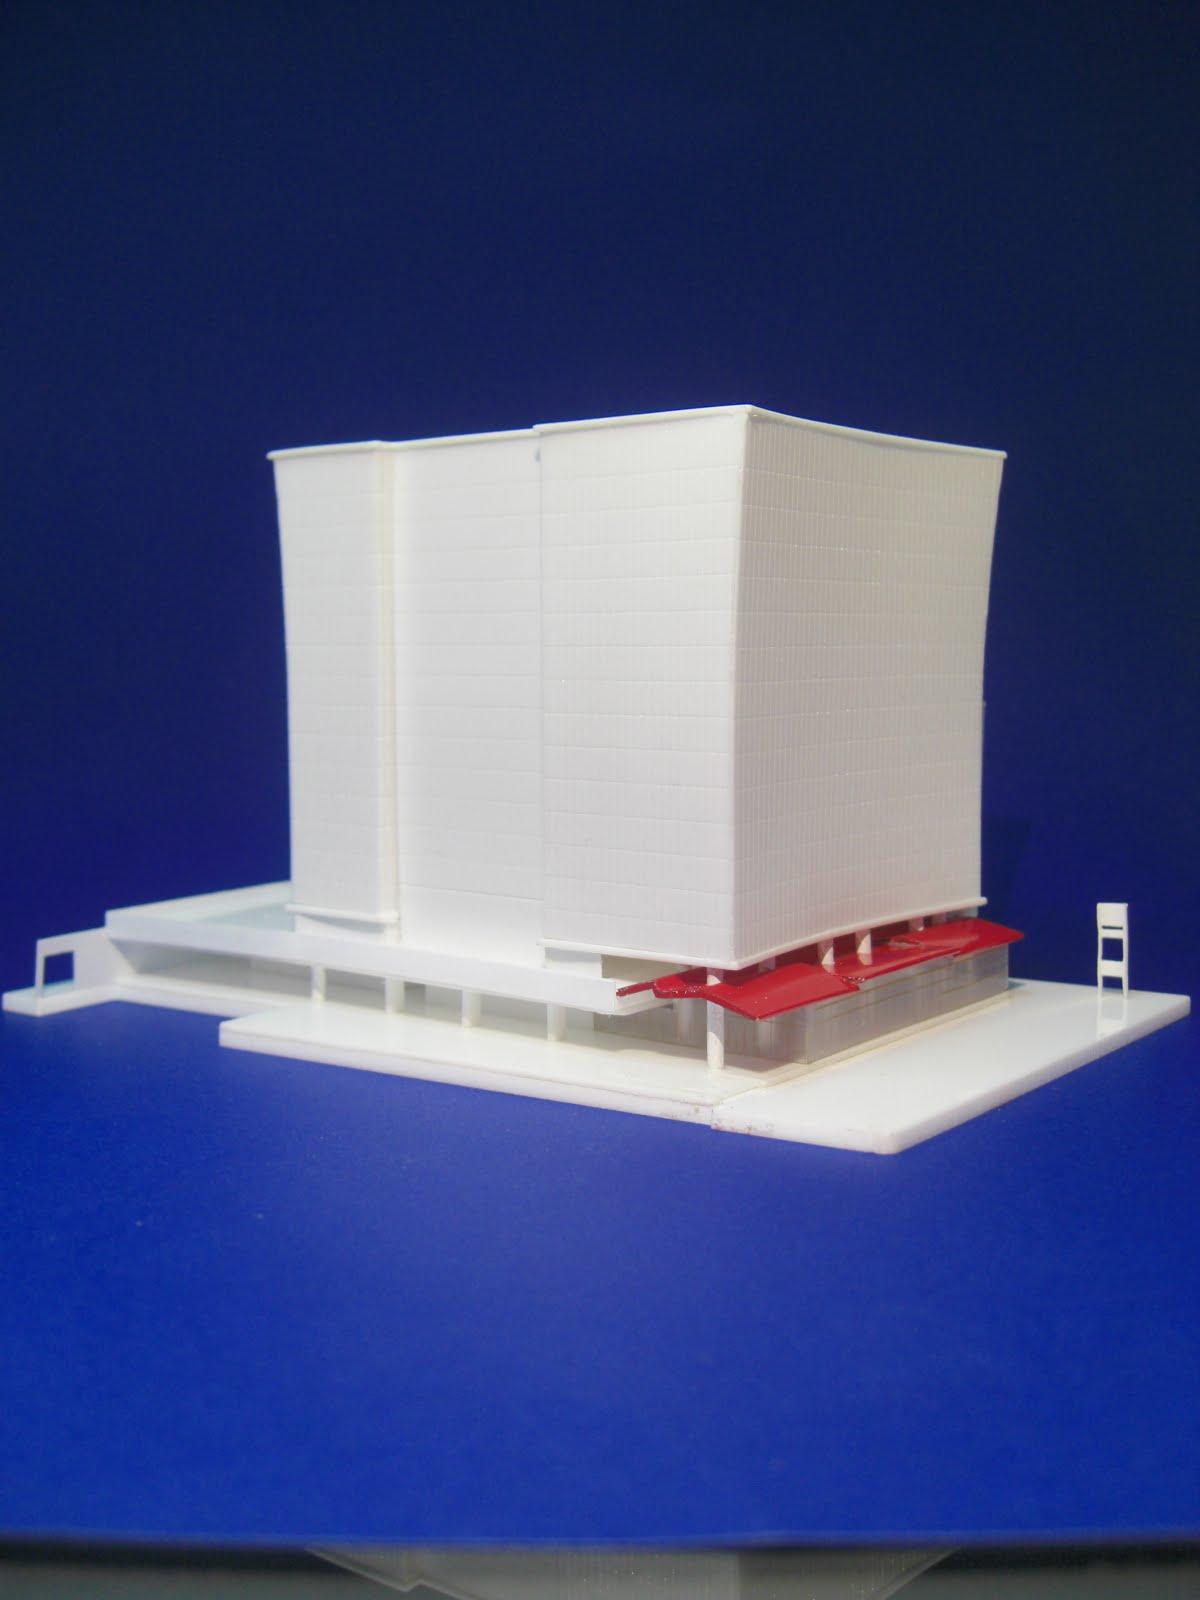 Centro Empresarial Toyota. Maqueta de estudio